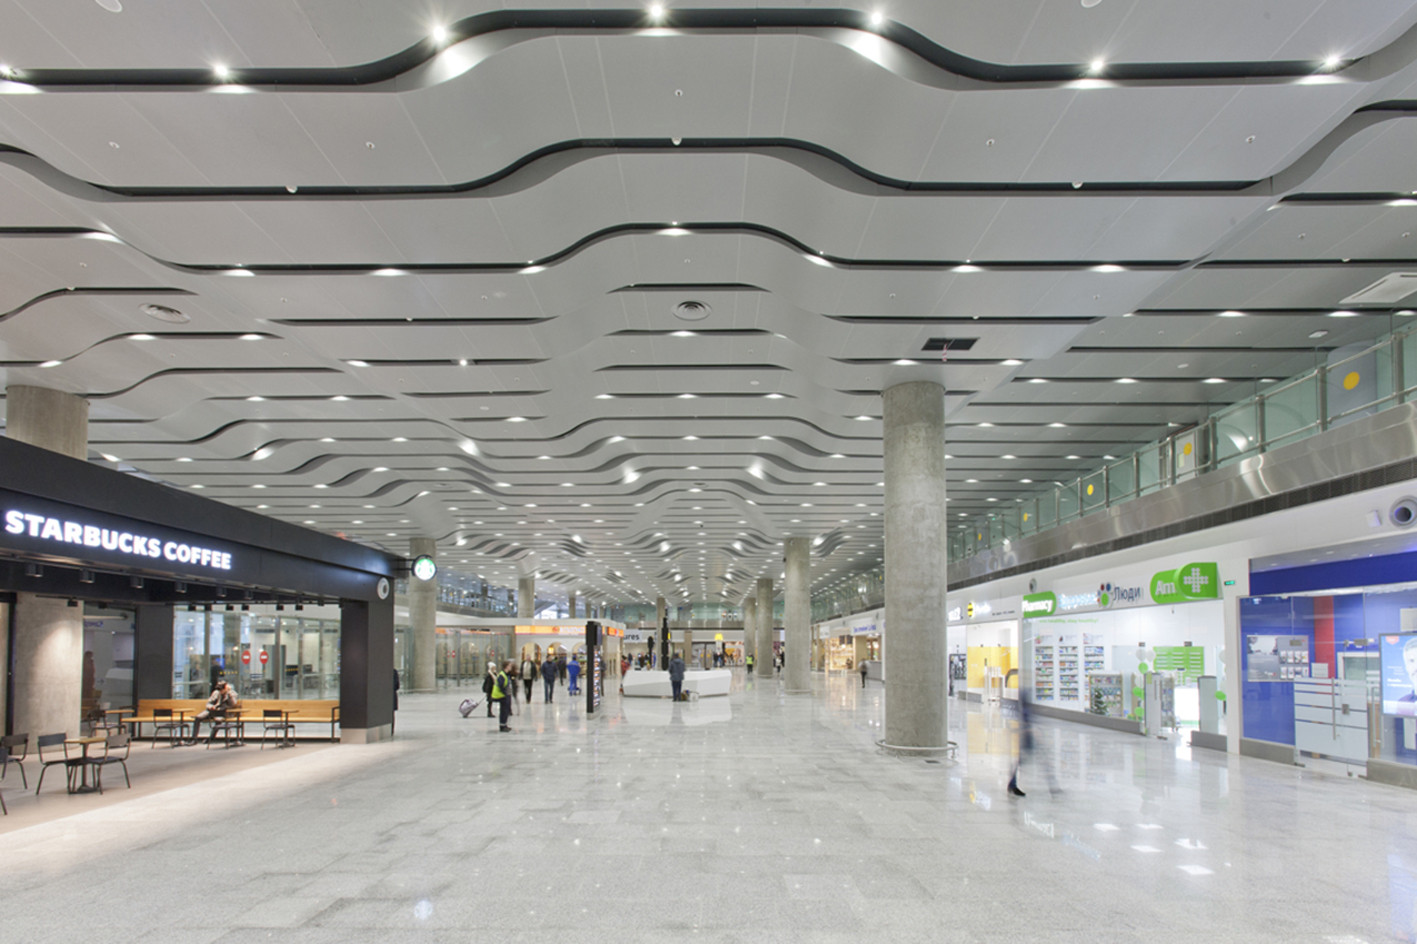 Pulkovo International Airport: description and infrastructure 33